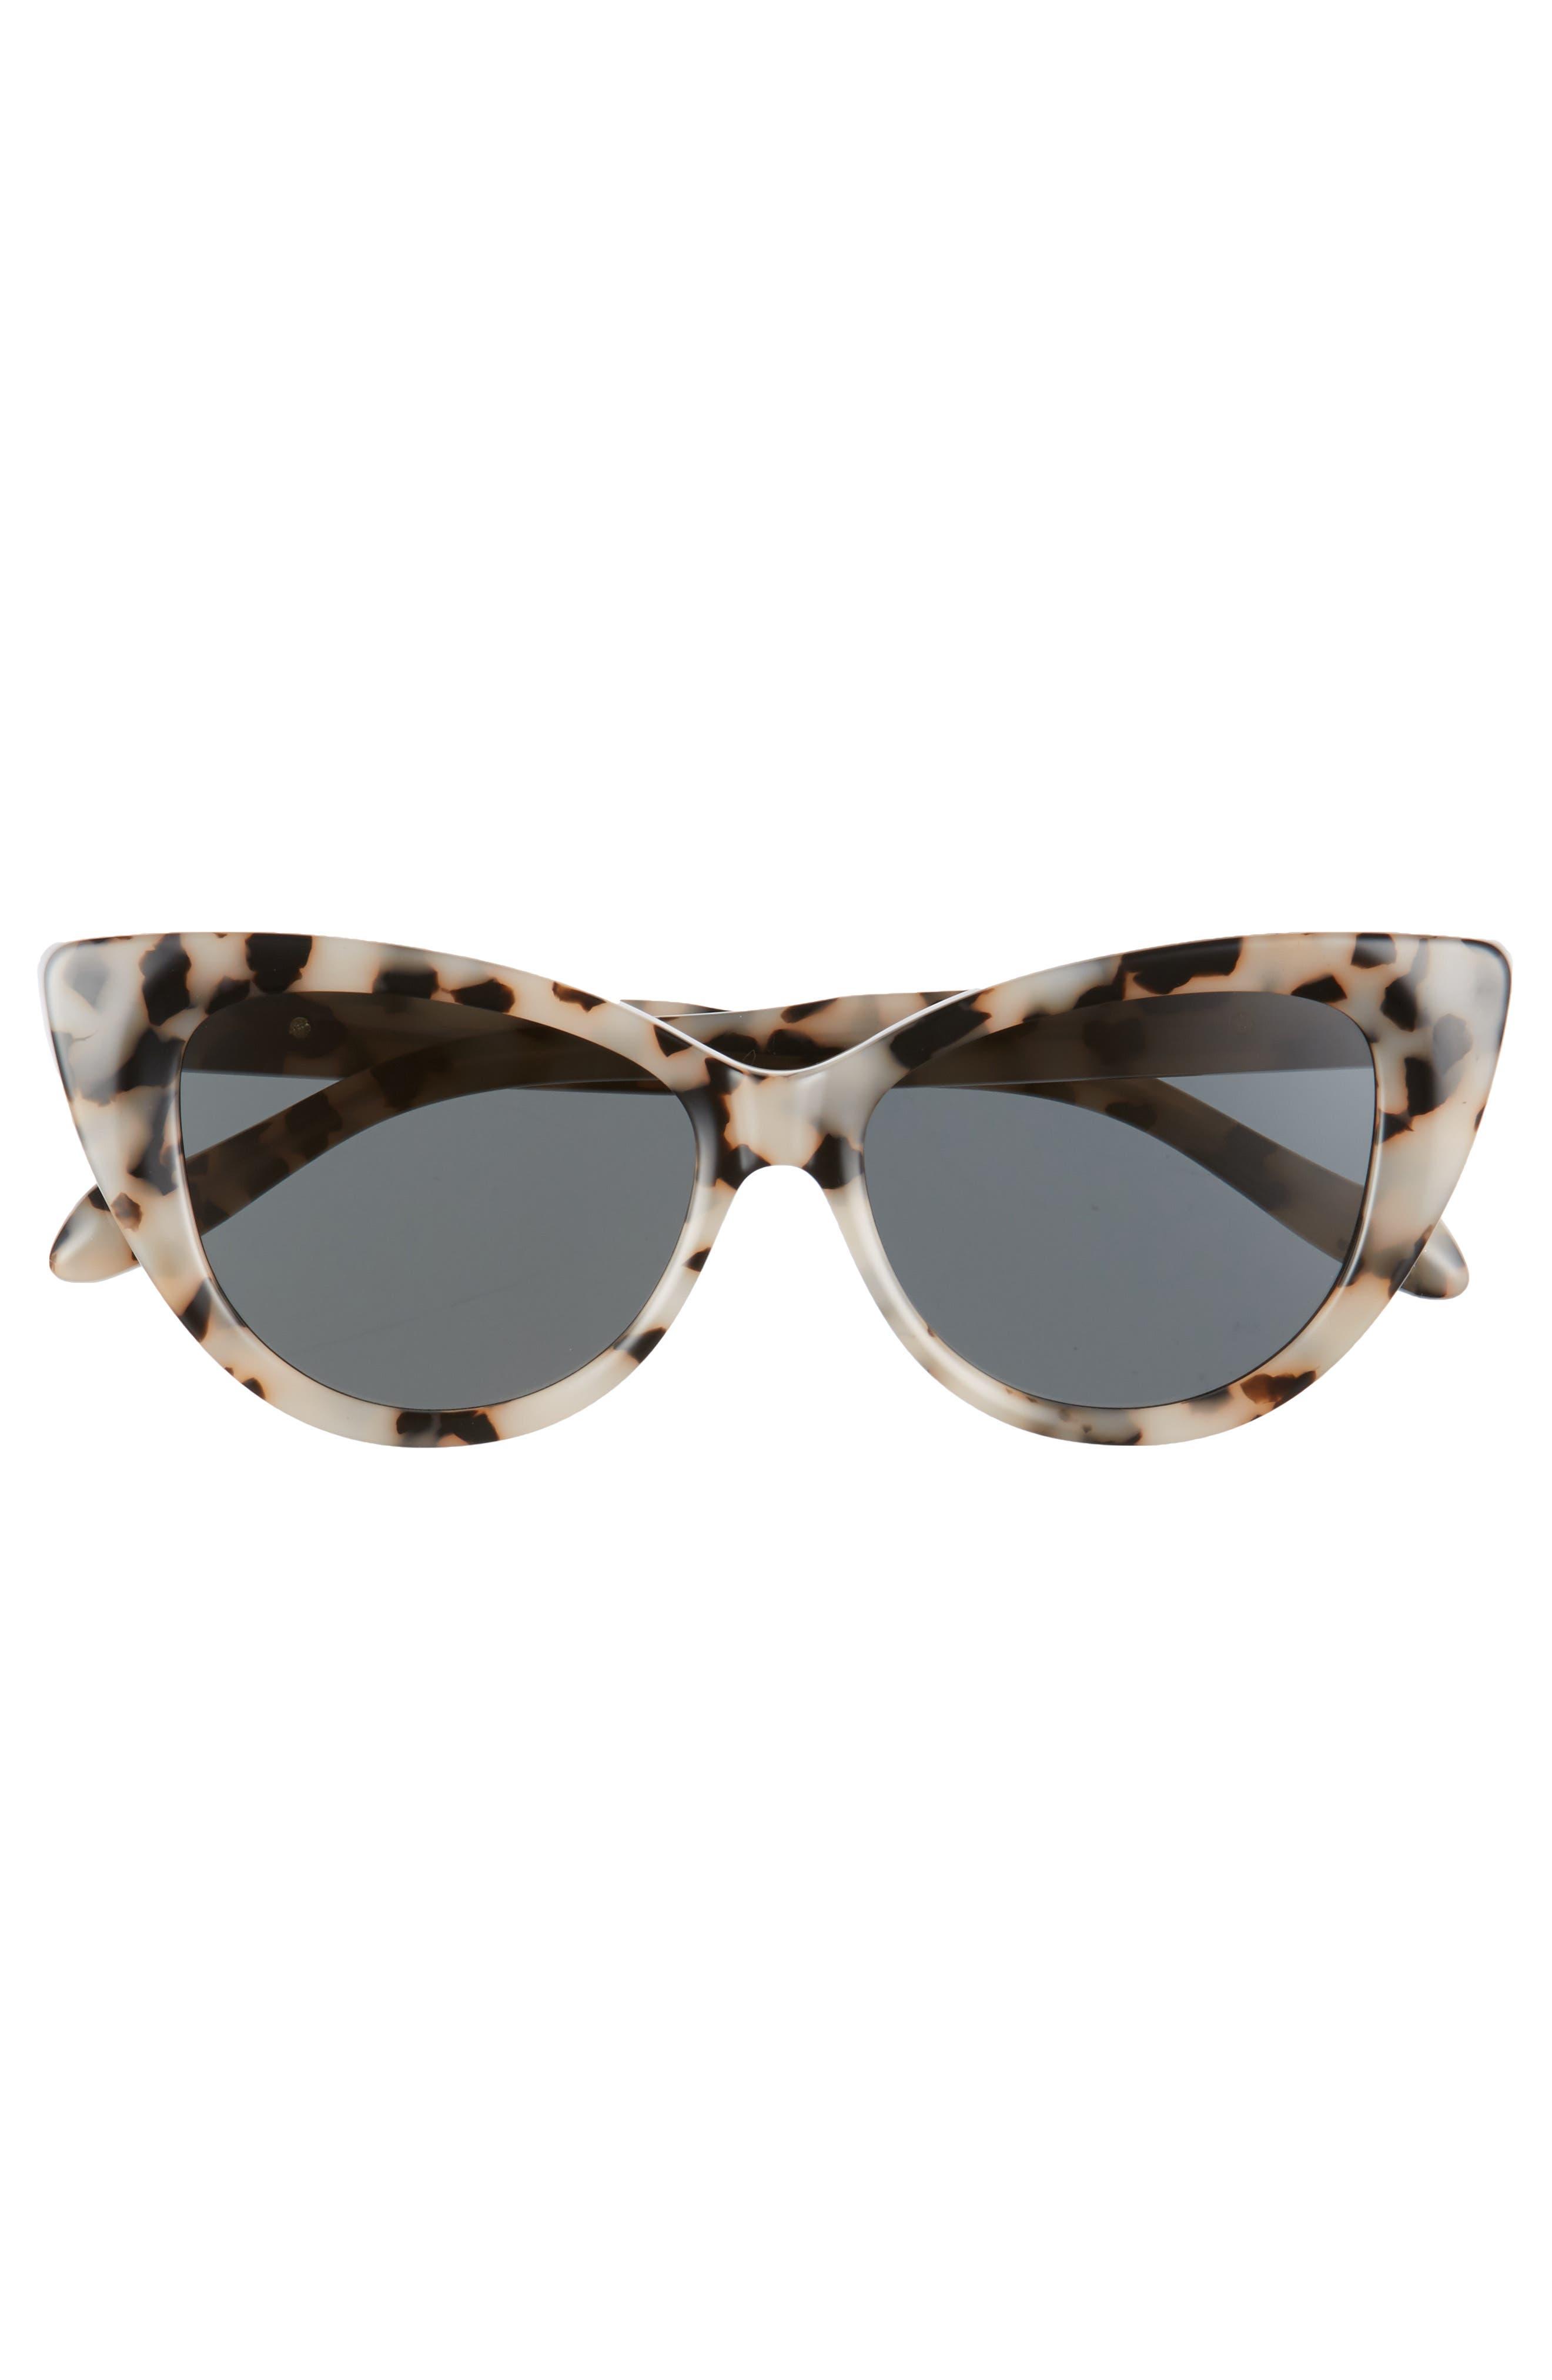 Kyoto 51mm Cat Eye Sunglasses,                             Alternate thumbnail 3, color,                             Milk Tortoise/ Black Solid